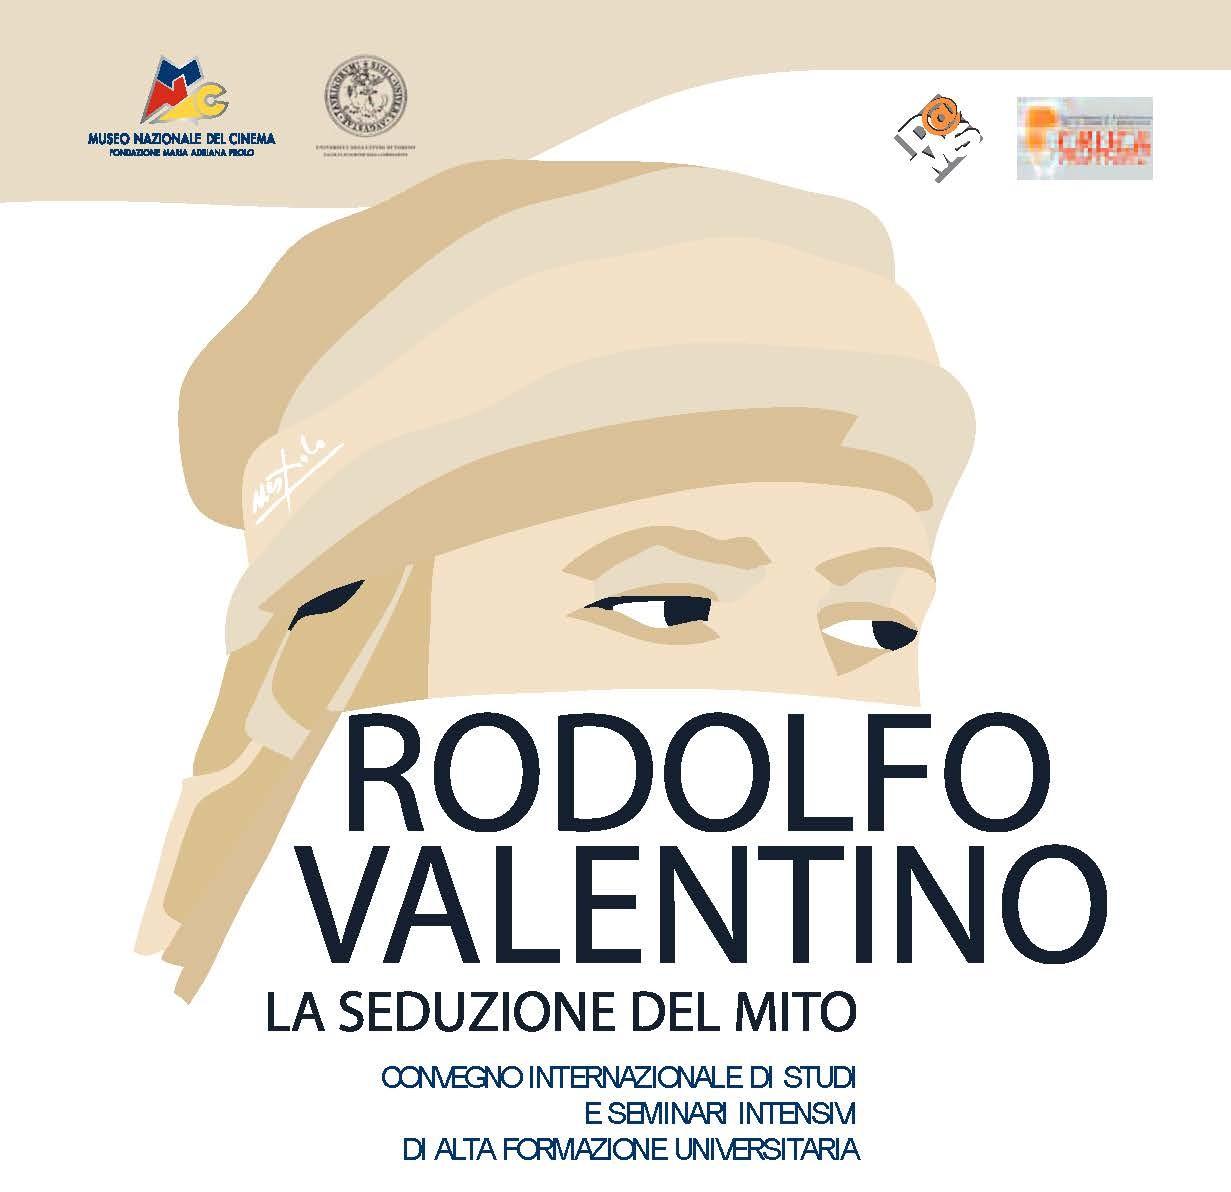 Rudolph Valentino Conference Program